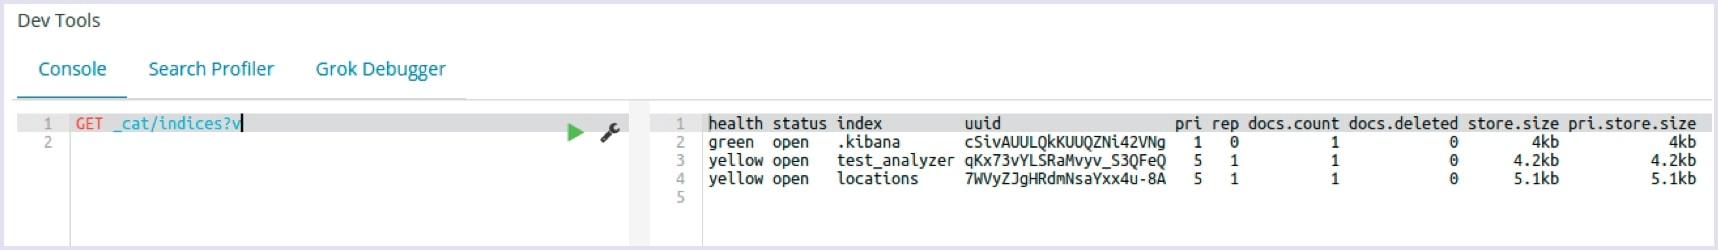 Implementing Elasticsearch: Kibana dev tools screenshot